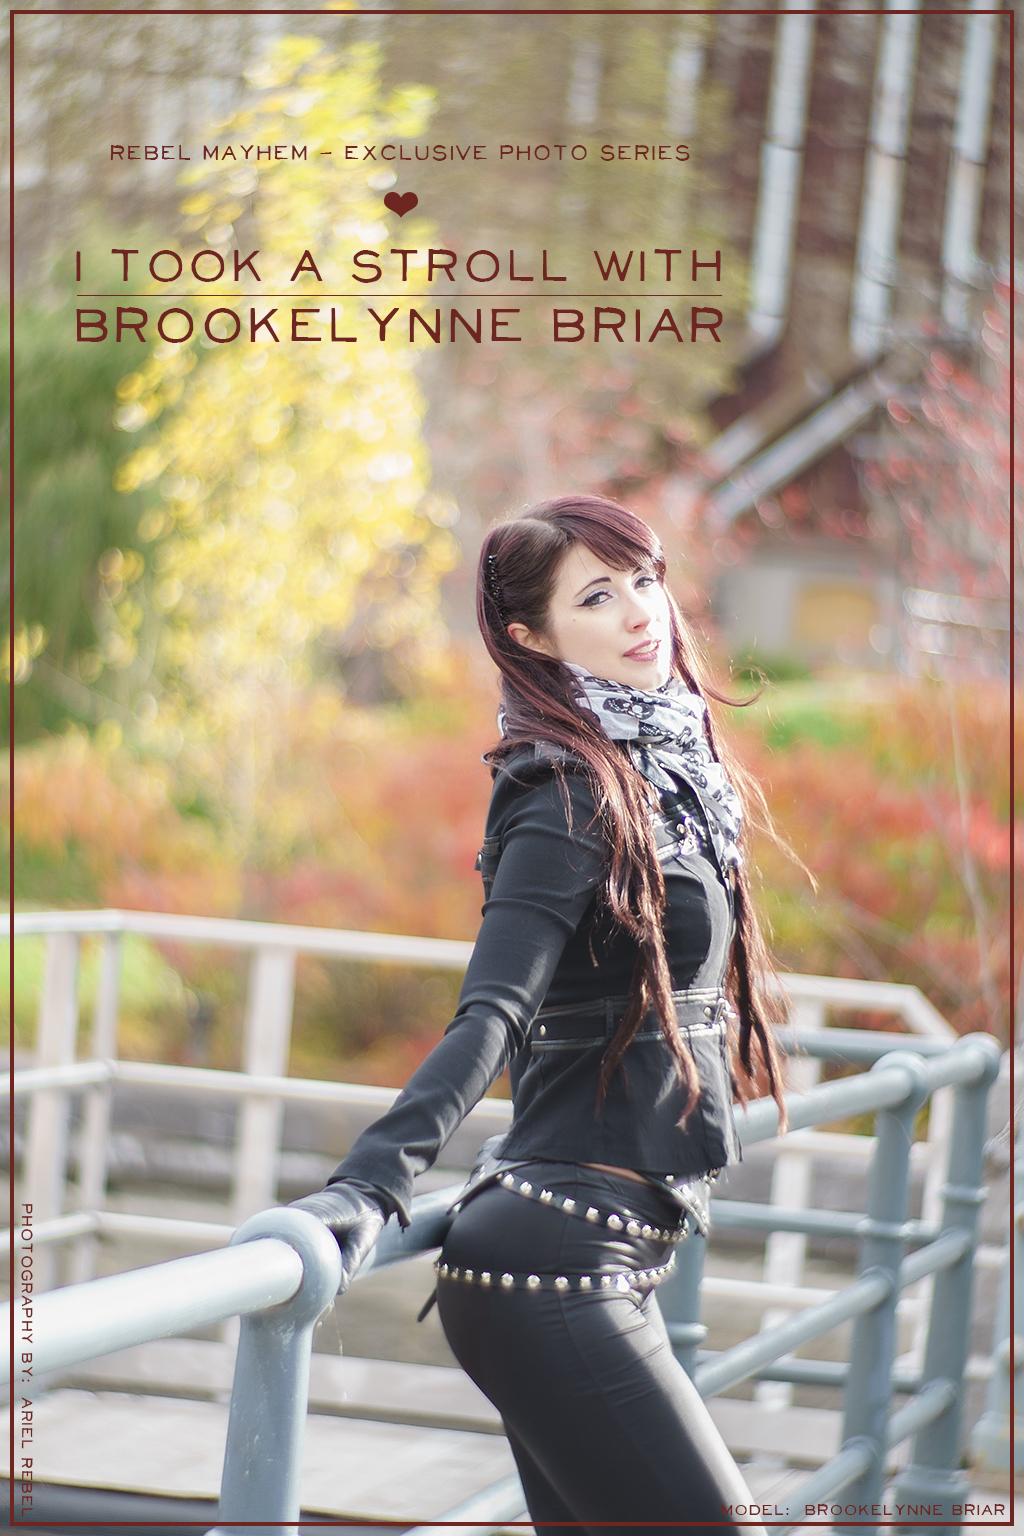 BrookelynneBriar_byArielRebel01